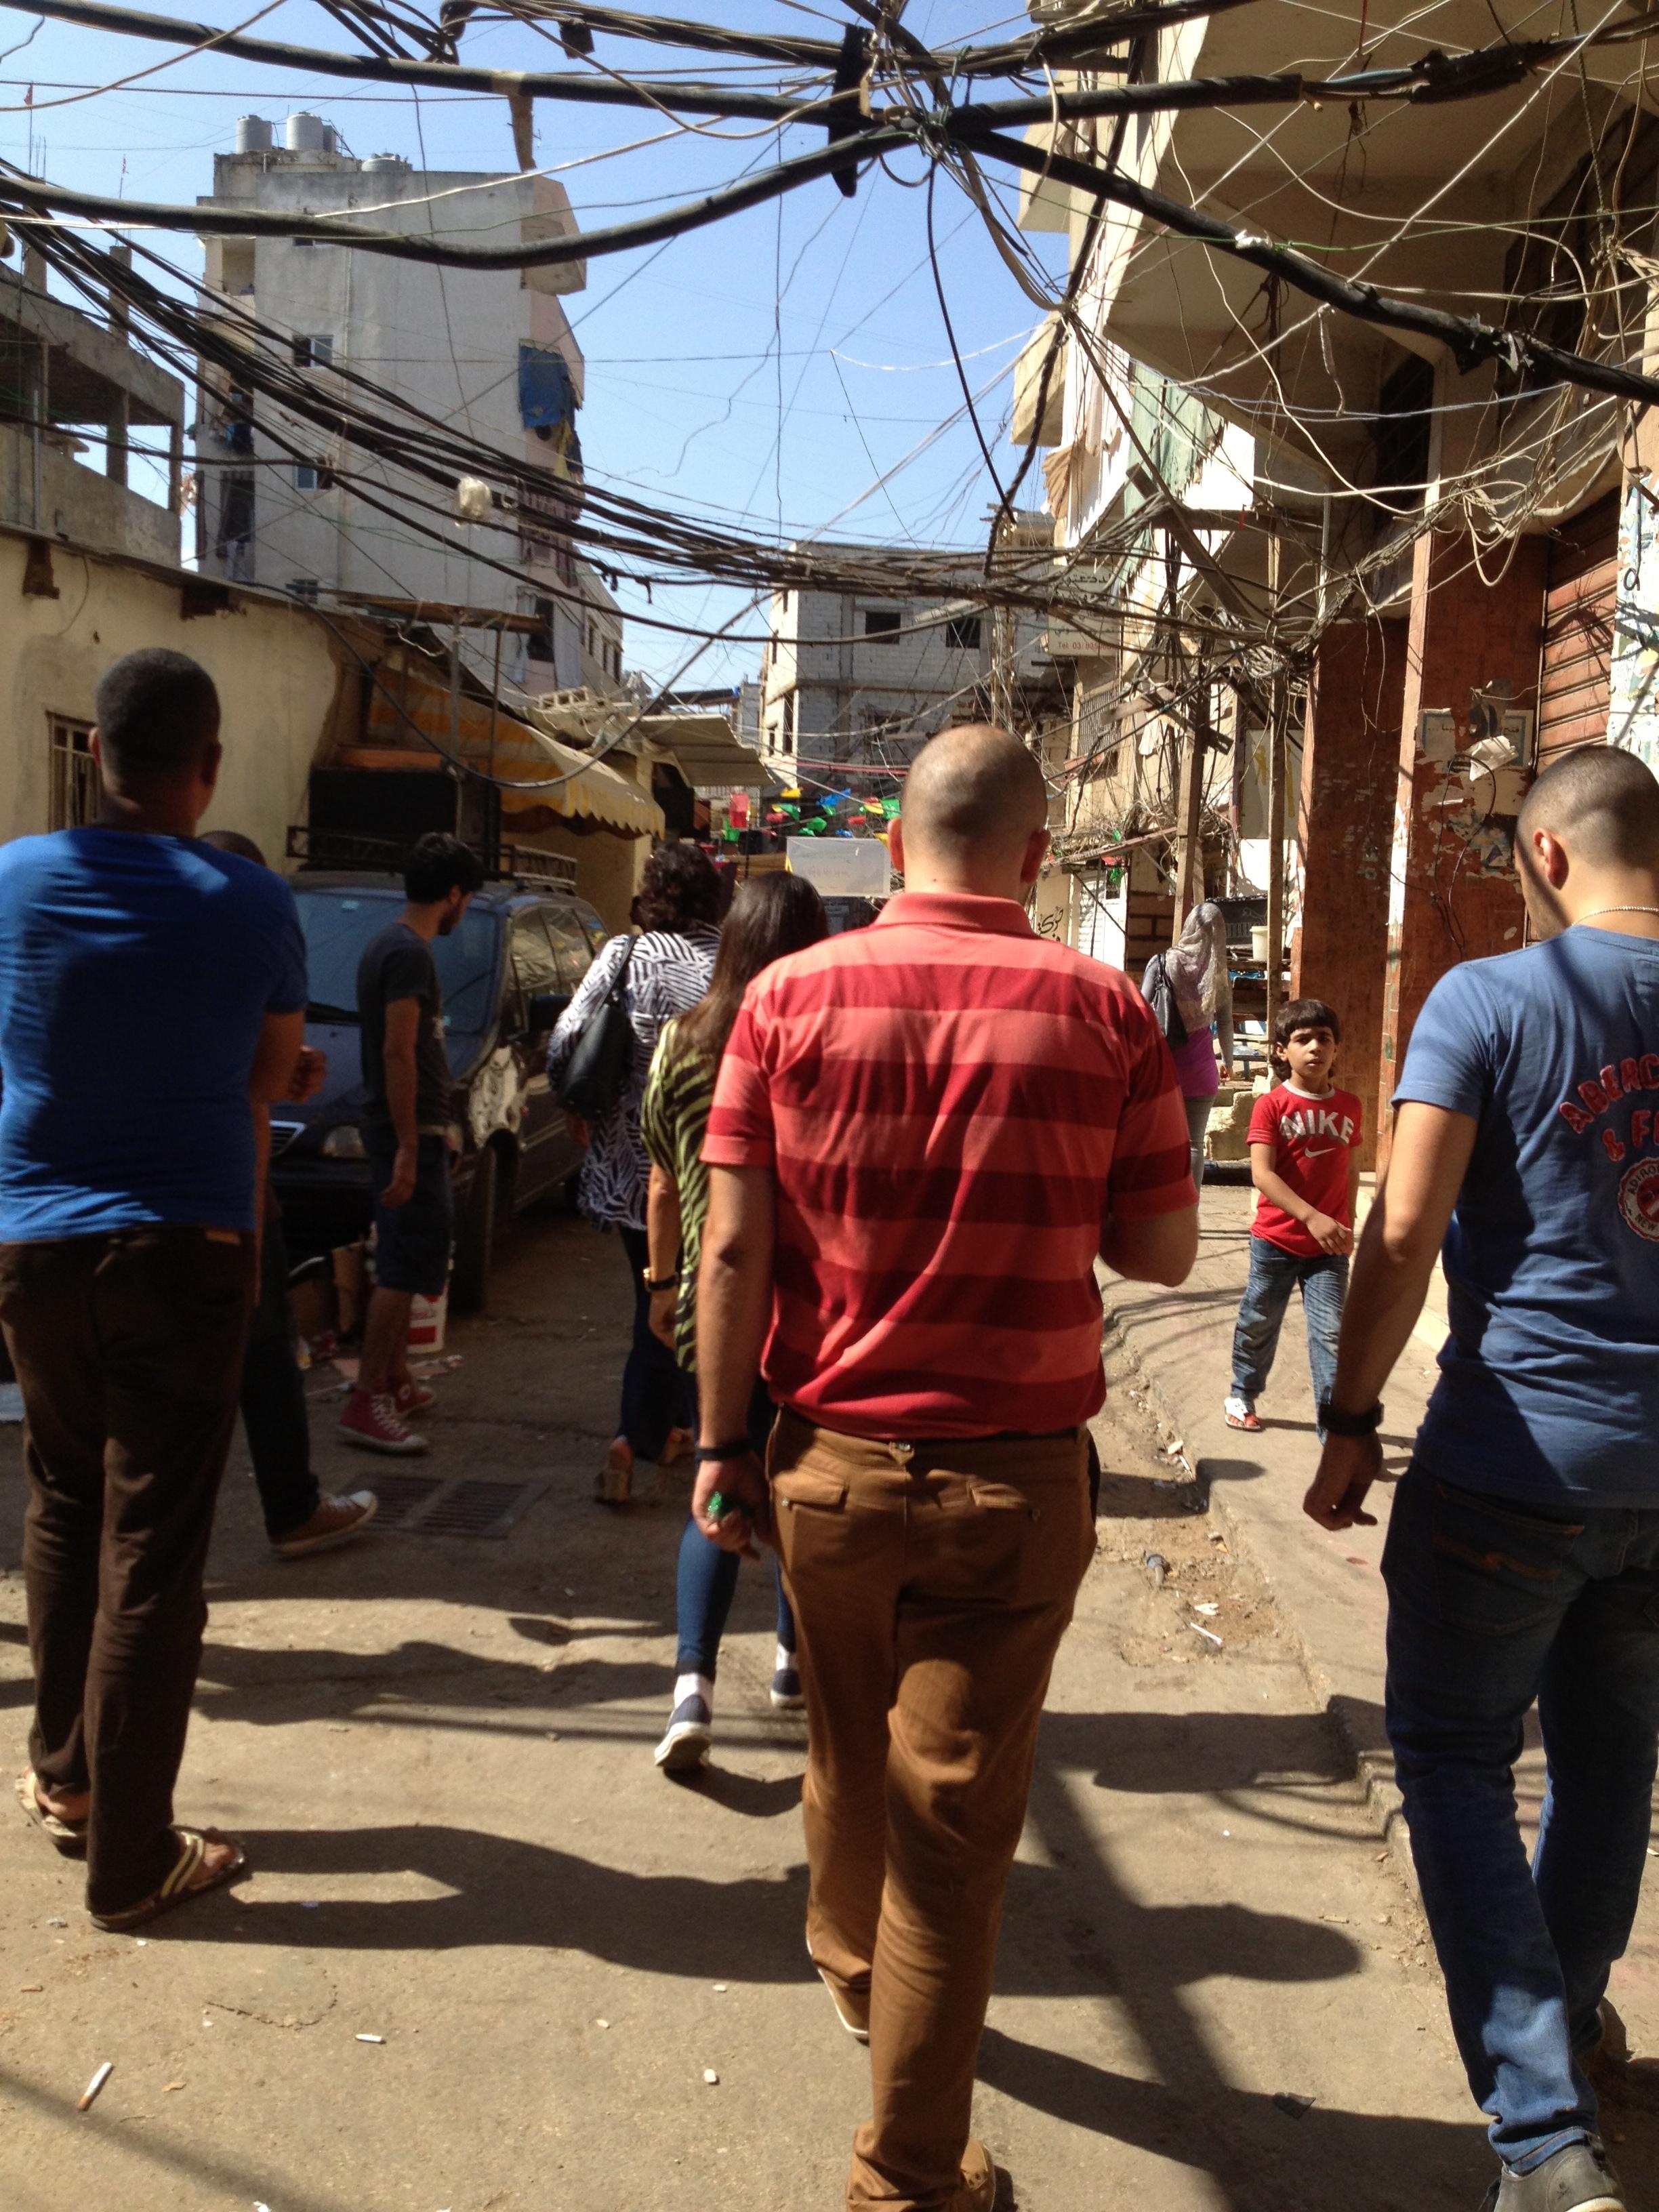 Welfare Association Youth Employment Services Team visits Burj El Barajneh - Beirut